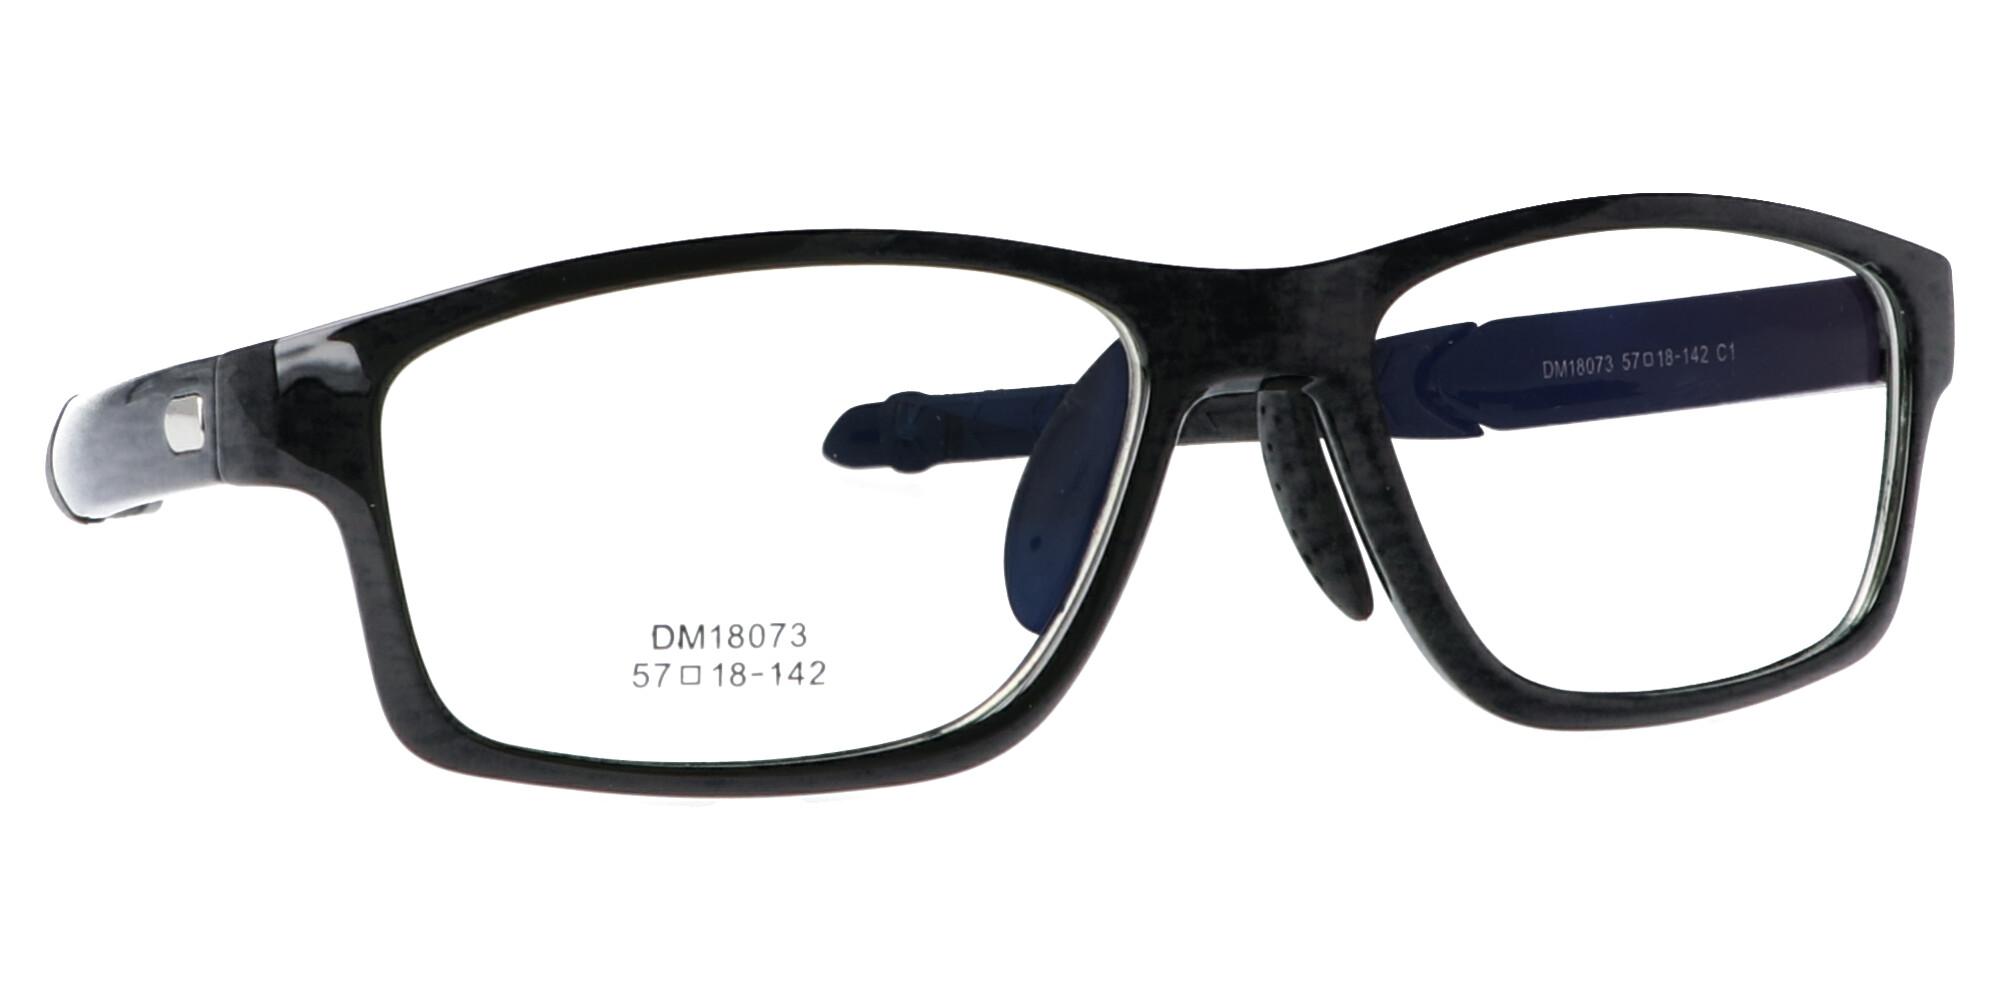 DM 18073_57_ブラック